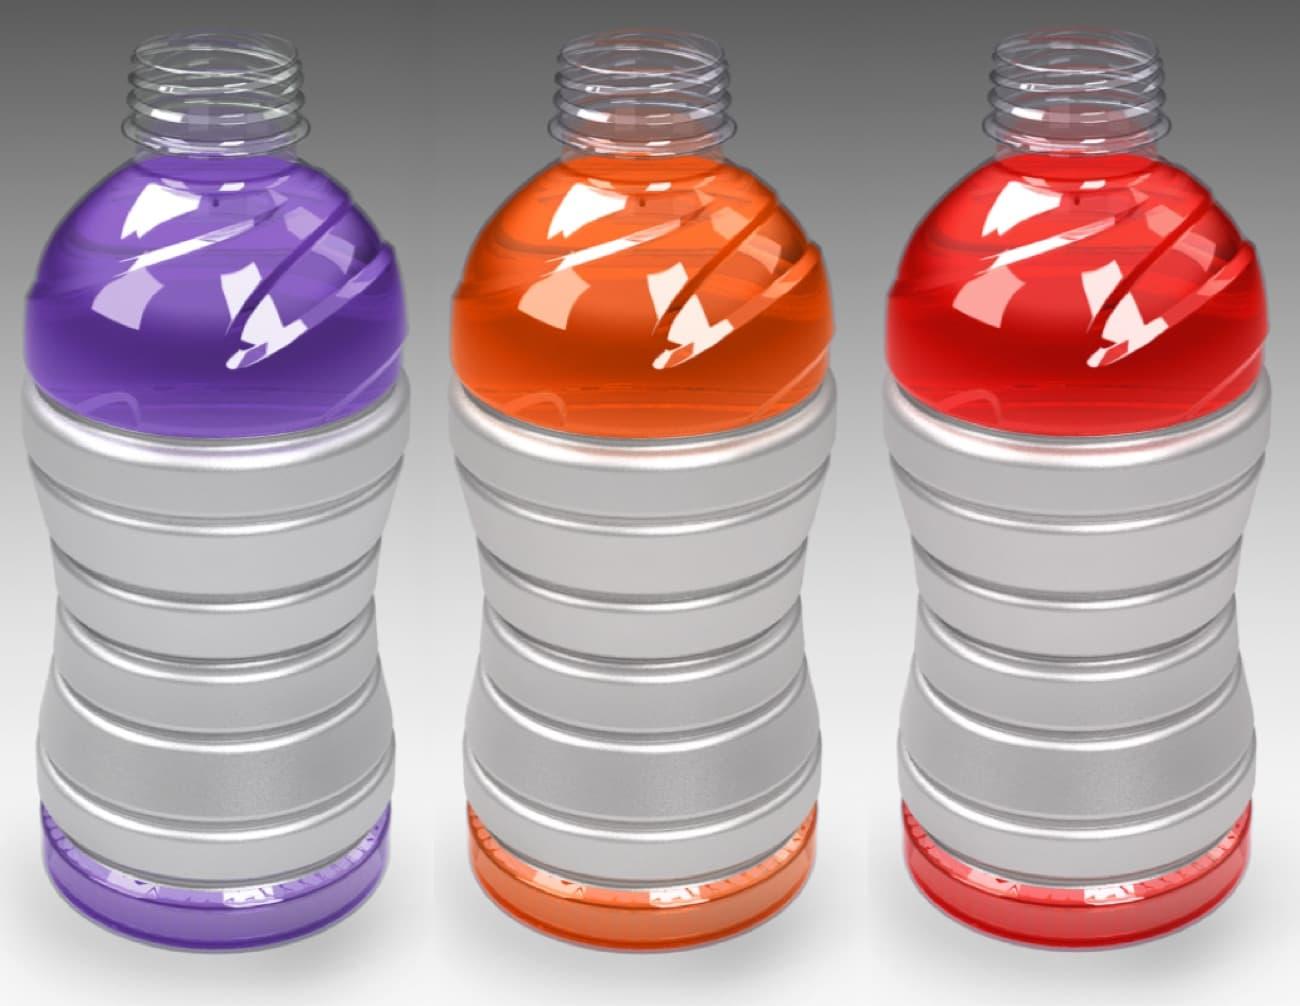 Concept art of three gatorade bottles